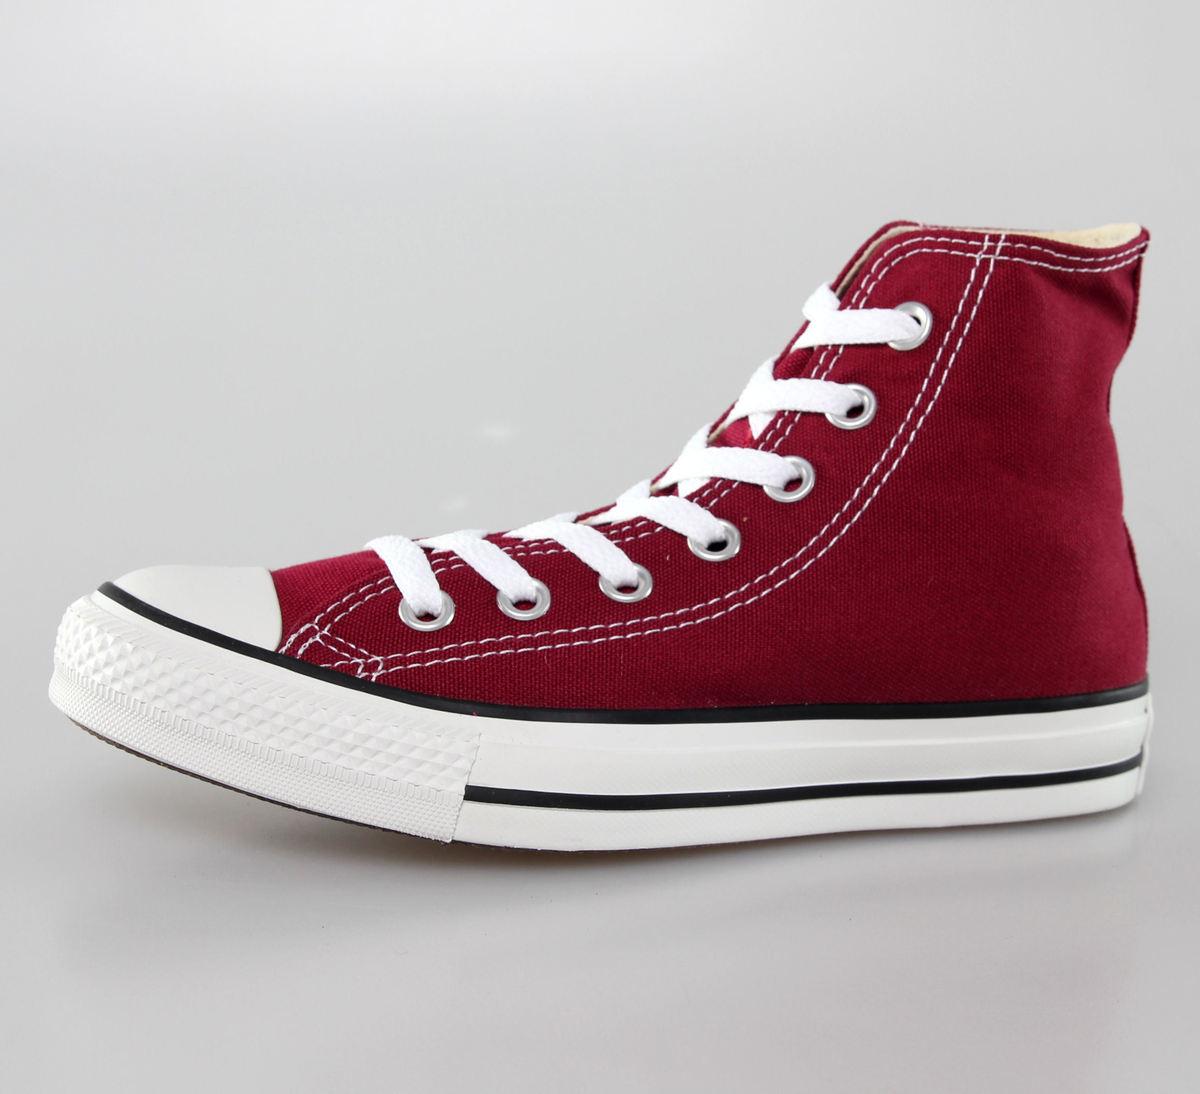 Sneaker CONVERSE - Chuck Taylor All Star Seasonal - Maroon - M9613 44,5 Converse